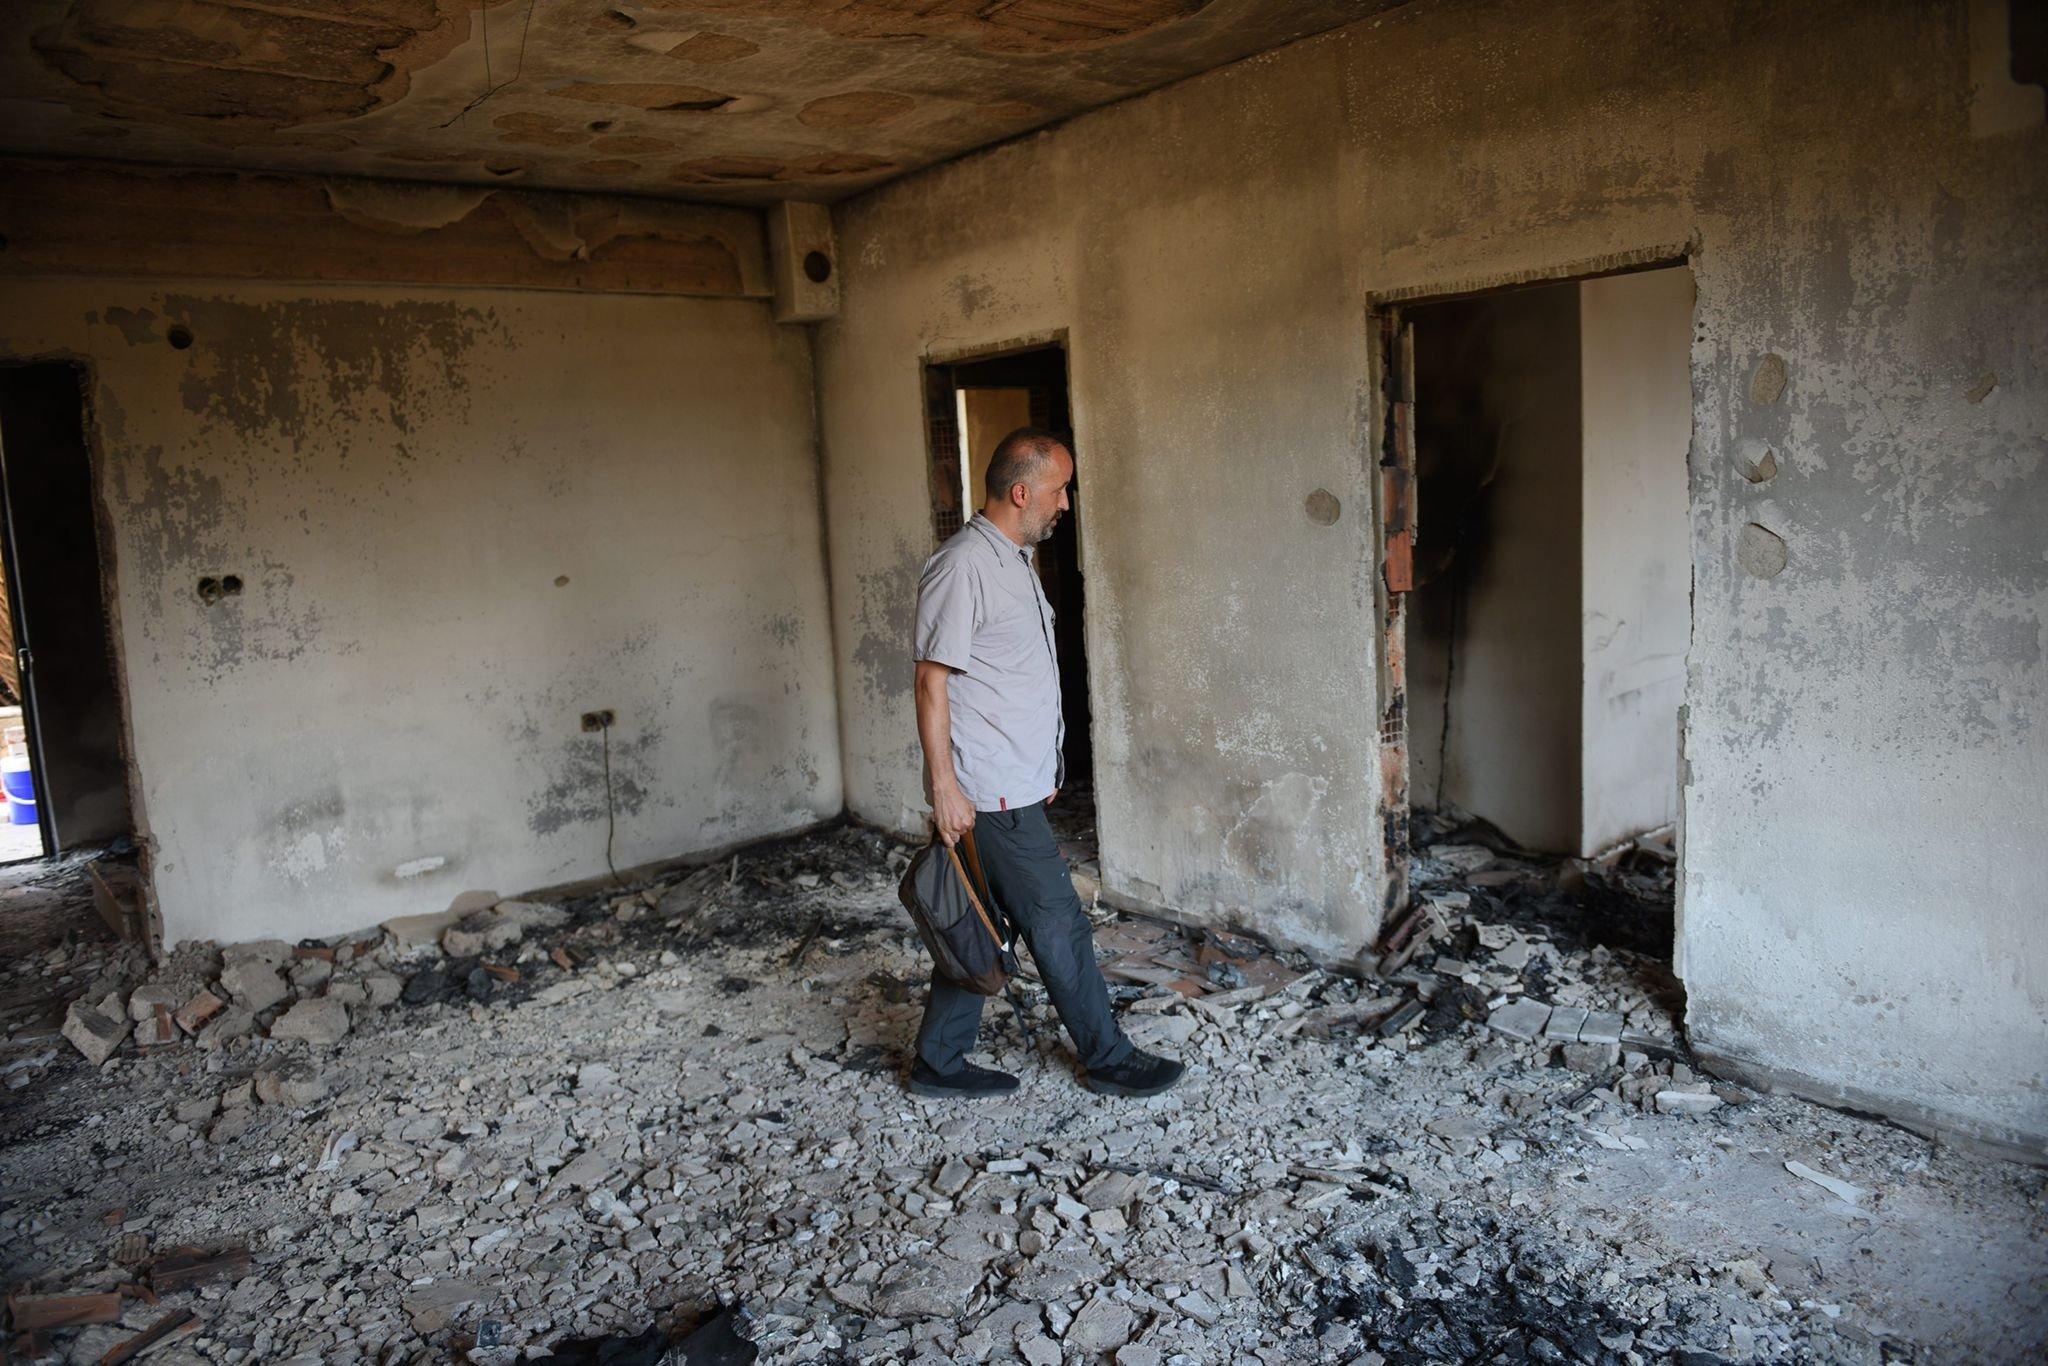 Journalist Zeynel Yaman in a house burned in the fire, in Aşağı Işıklar village, in Antalya, southern Turkey, Aug. 4, 2021. (PHOTO BY MURAT ŞENGÜL)